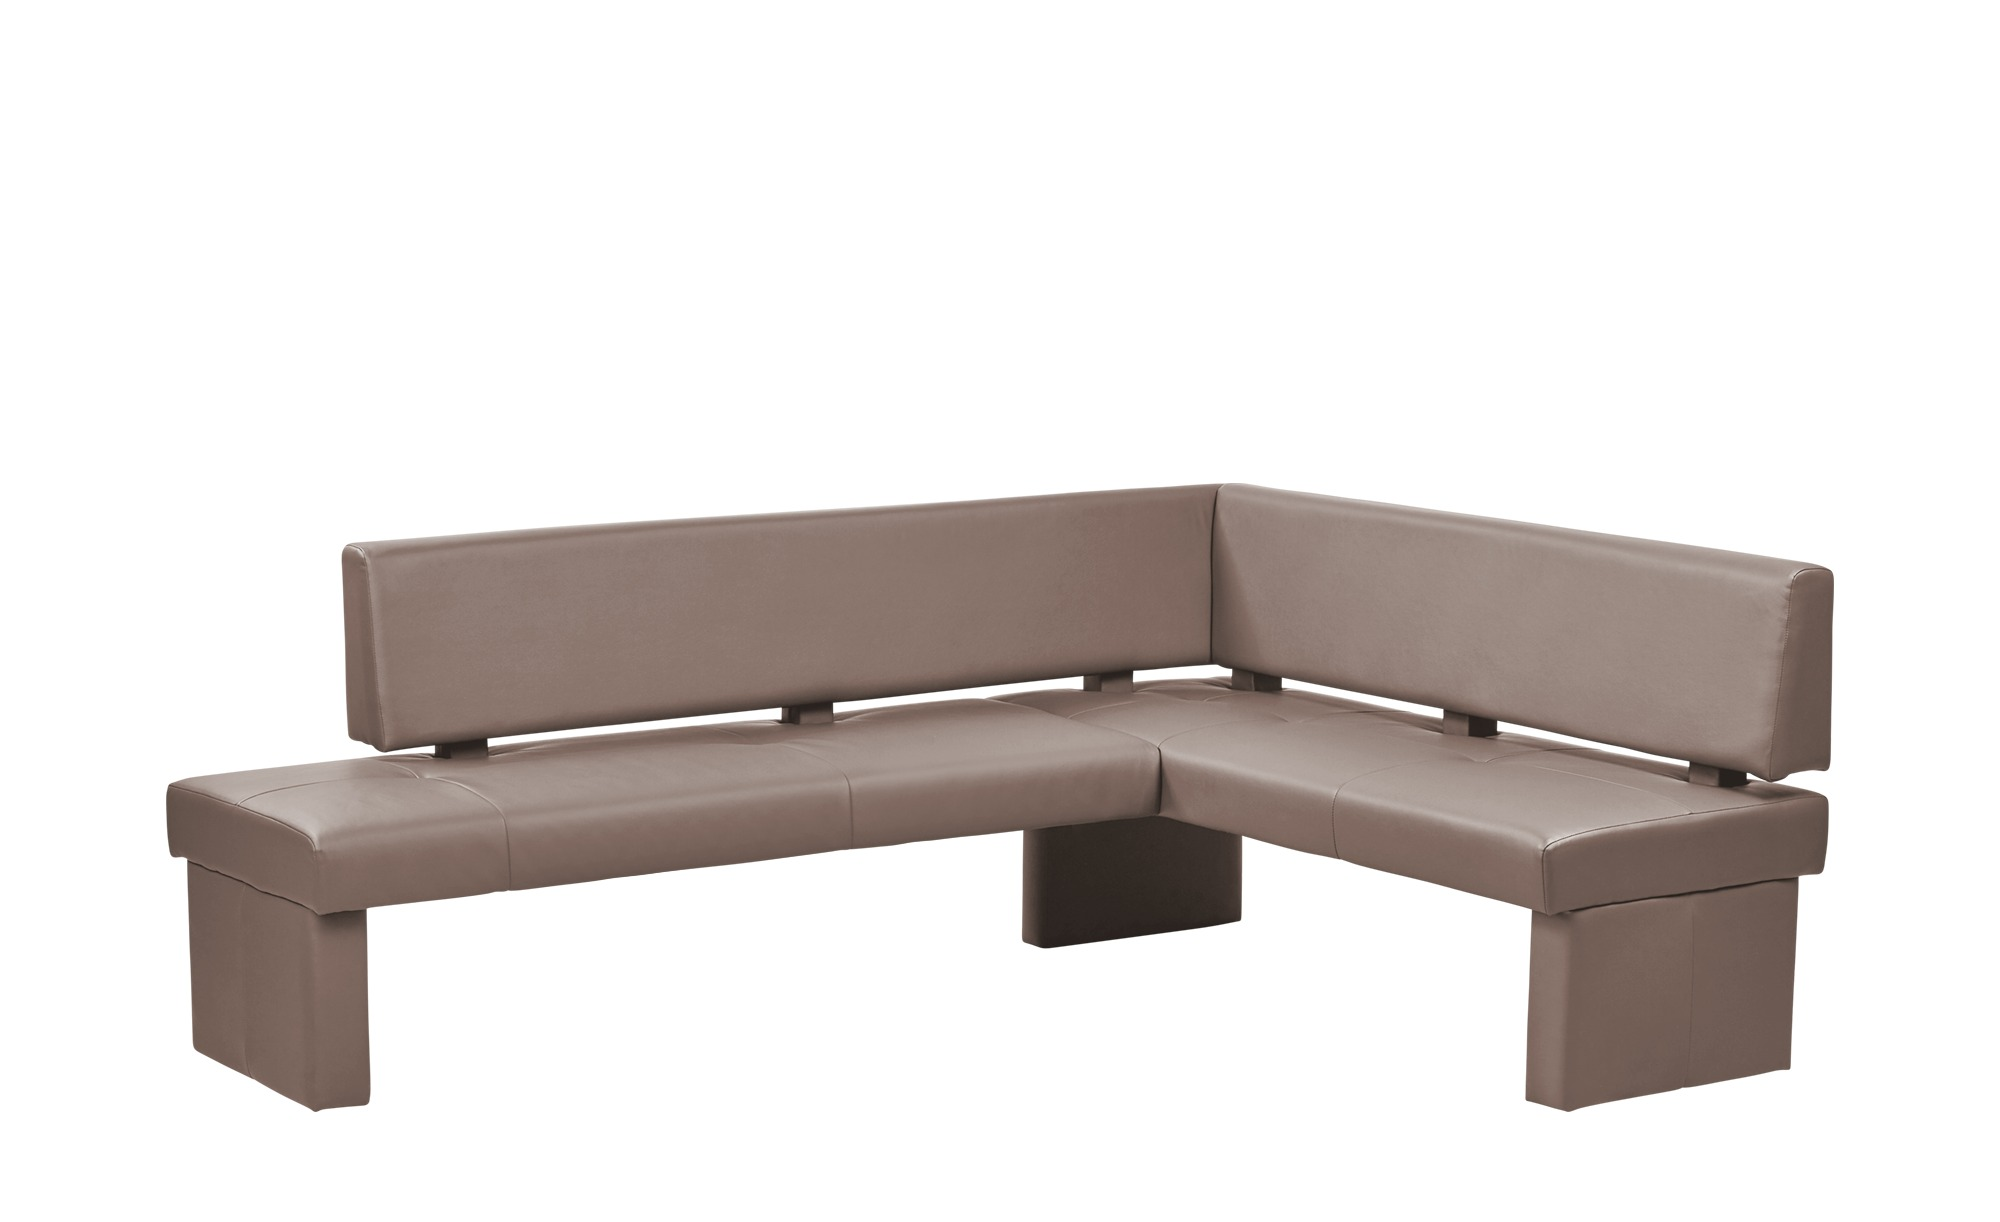 Woodford Eckbank  Seta - grau - 86 cm - Bänke > Eckbänke - Möbel Kraft | Küche und Esszimmer > Sitzbänke > Eckbänke | Woodford